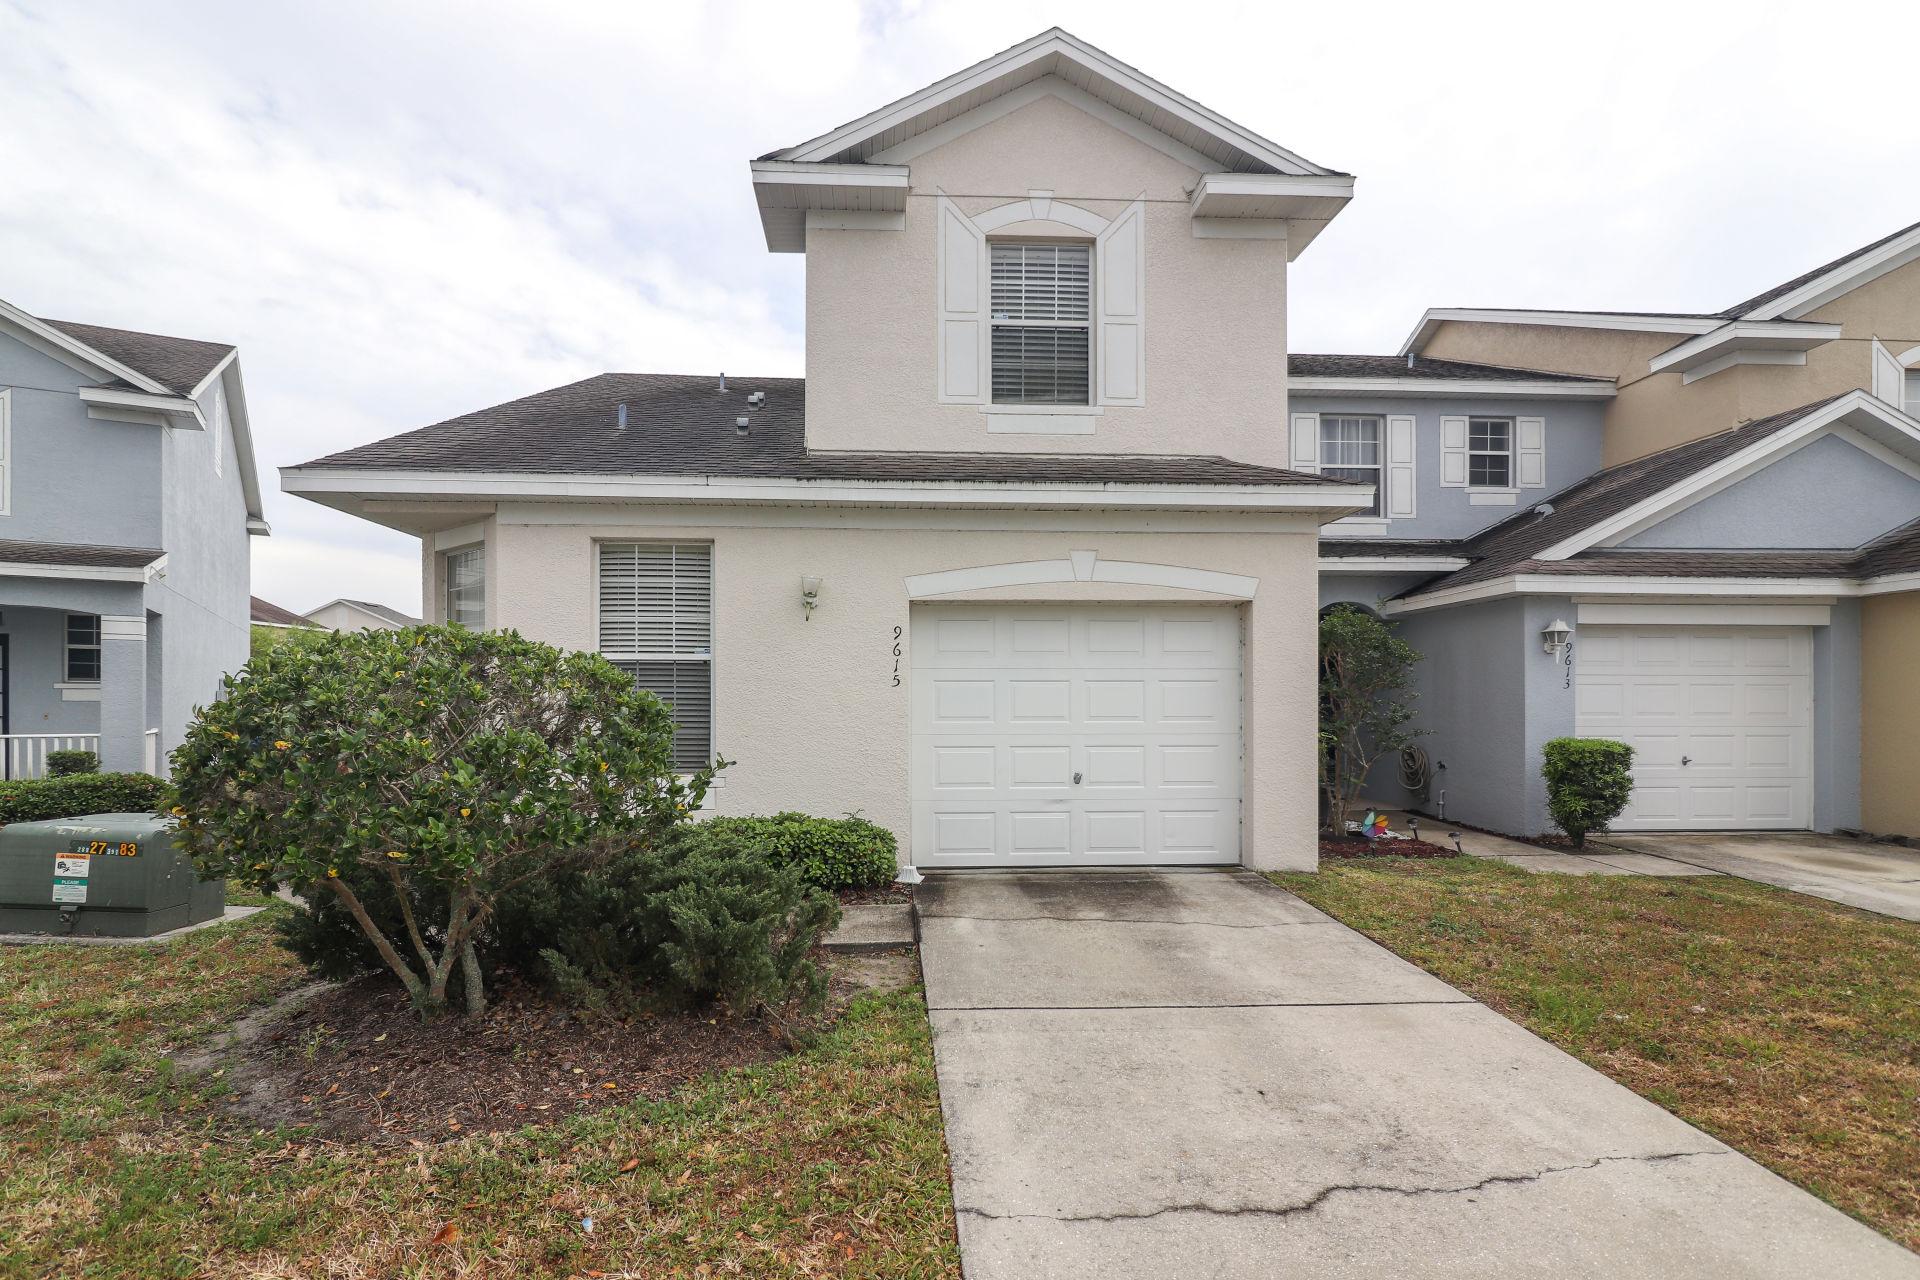 9615 Carlsdale Dr, Riverview, FL 33578